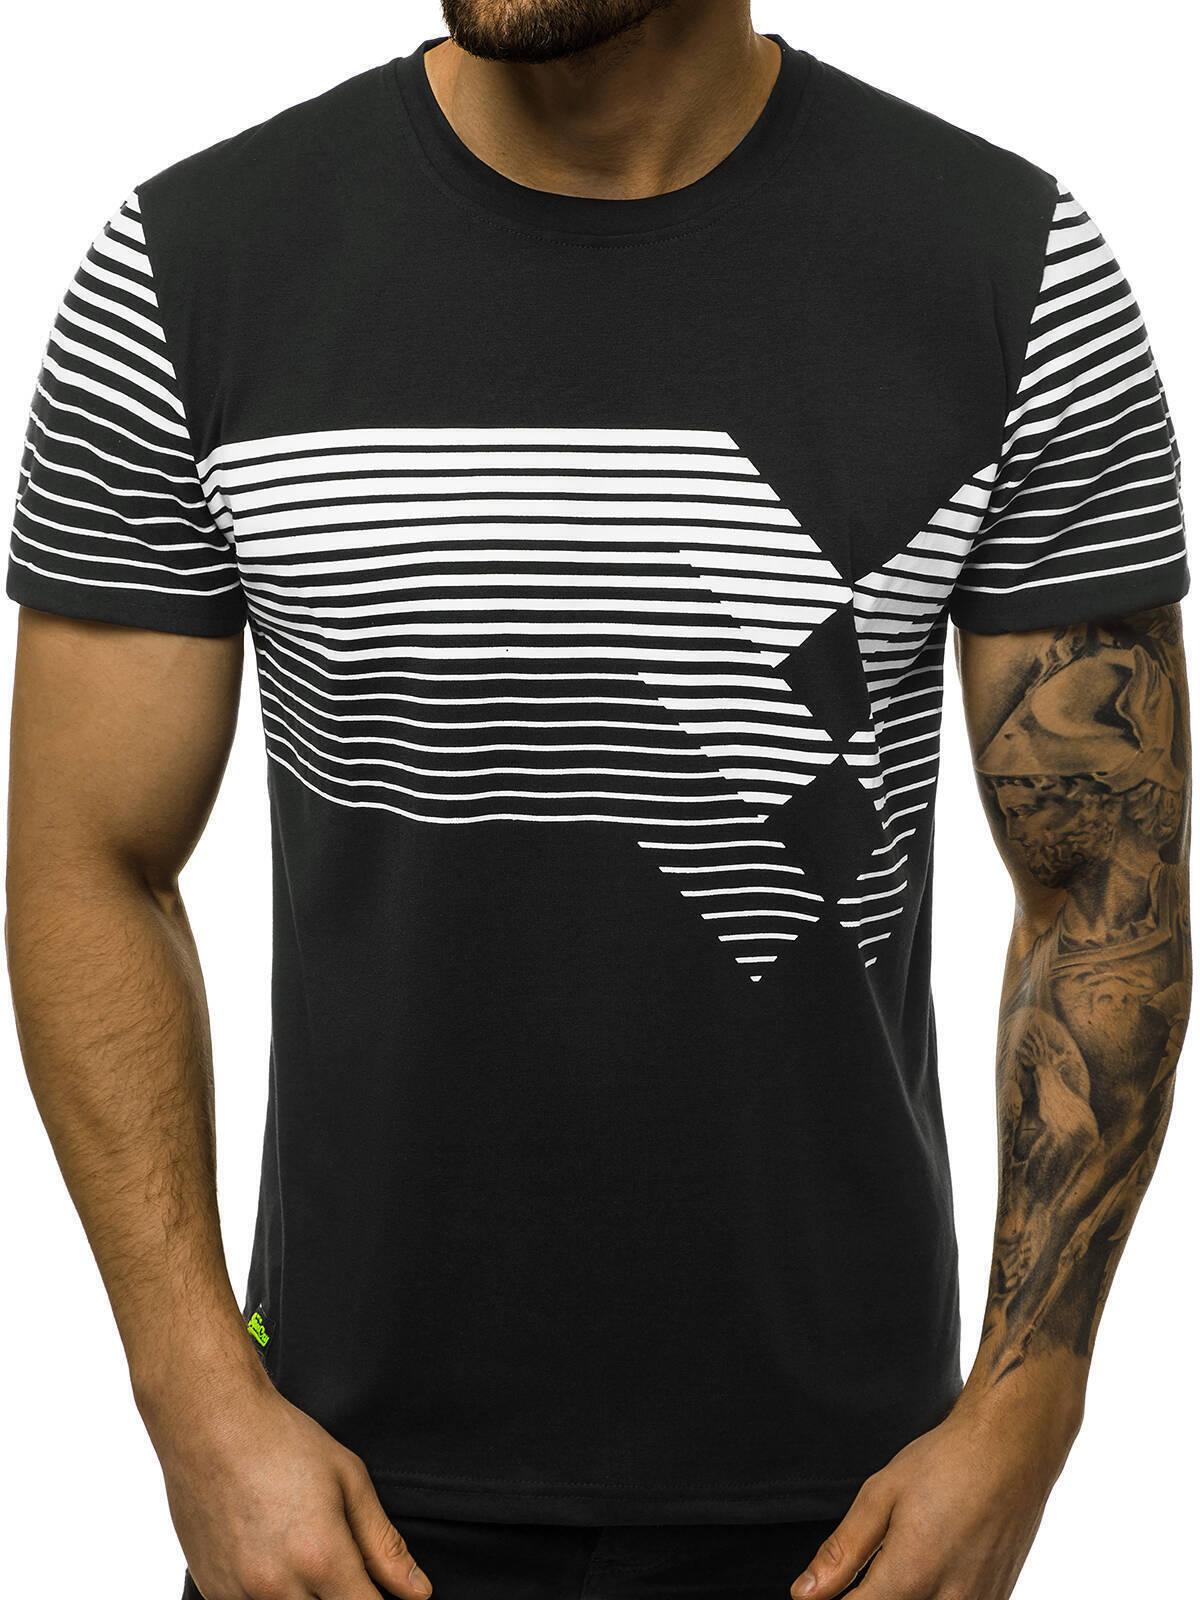 Indexbild 27 - T-Shirt Kurzarm Print Aufdruck Fitness Jogging Sport Shirt Herren OZONEE 12511